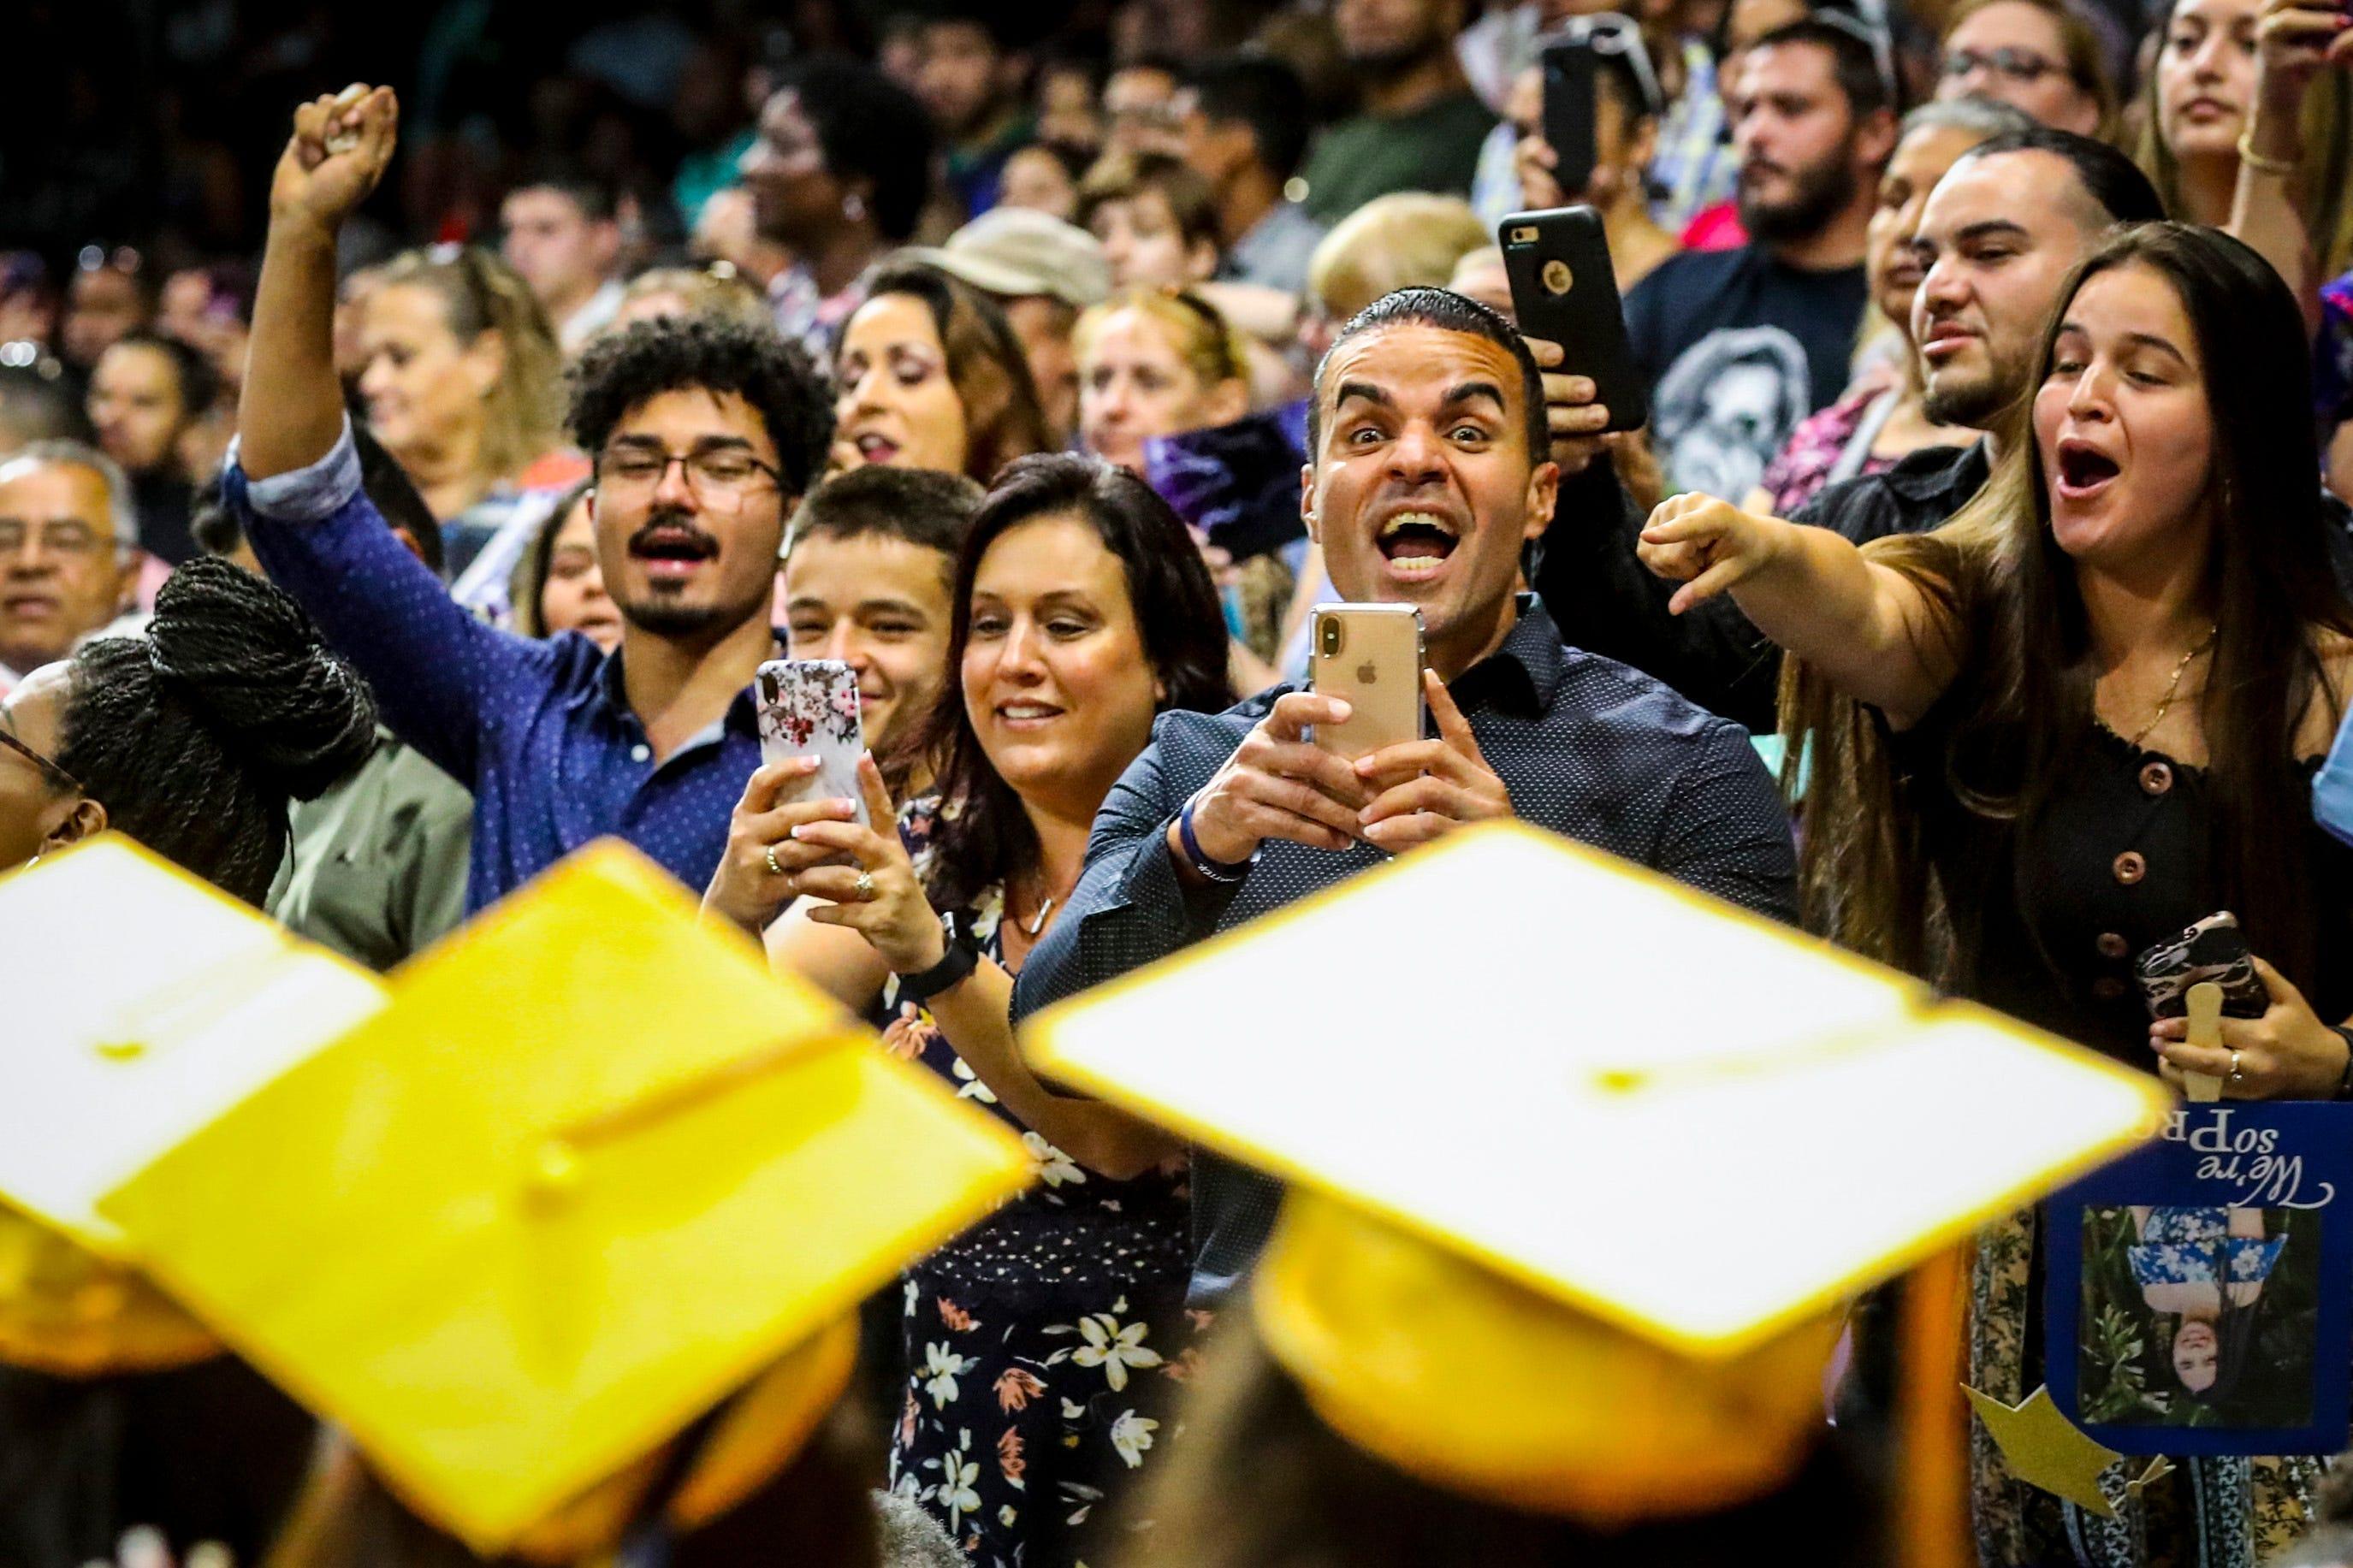 I m heartbroken entirely : Coronavirus threatens high school seniors  graduation dreams